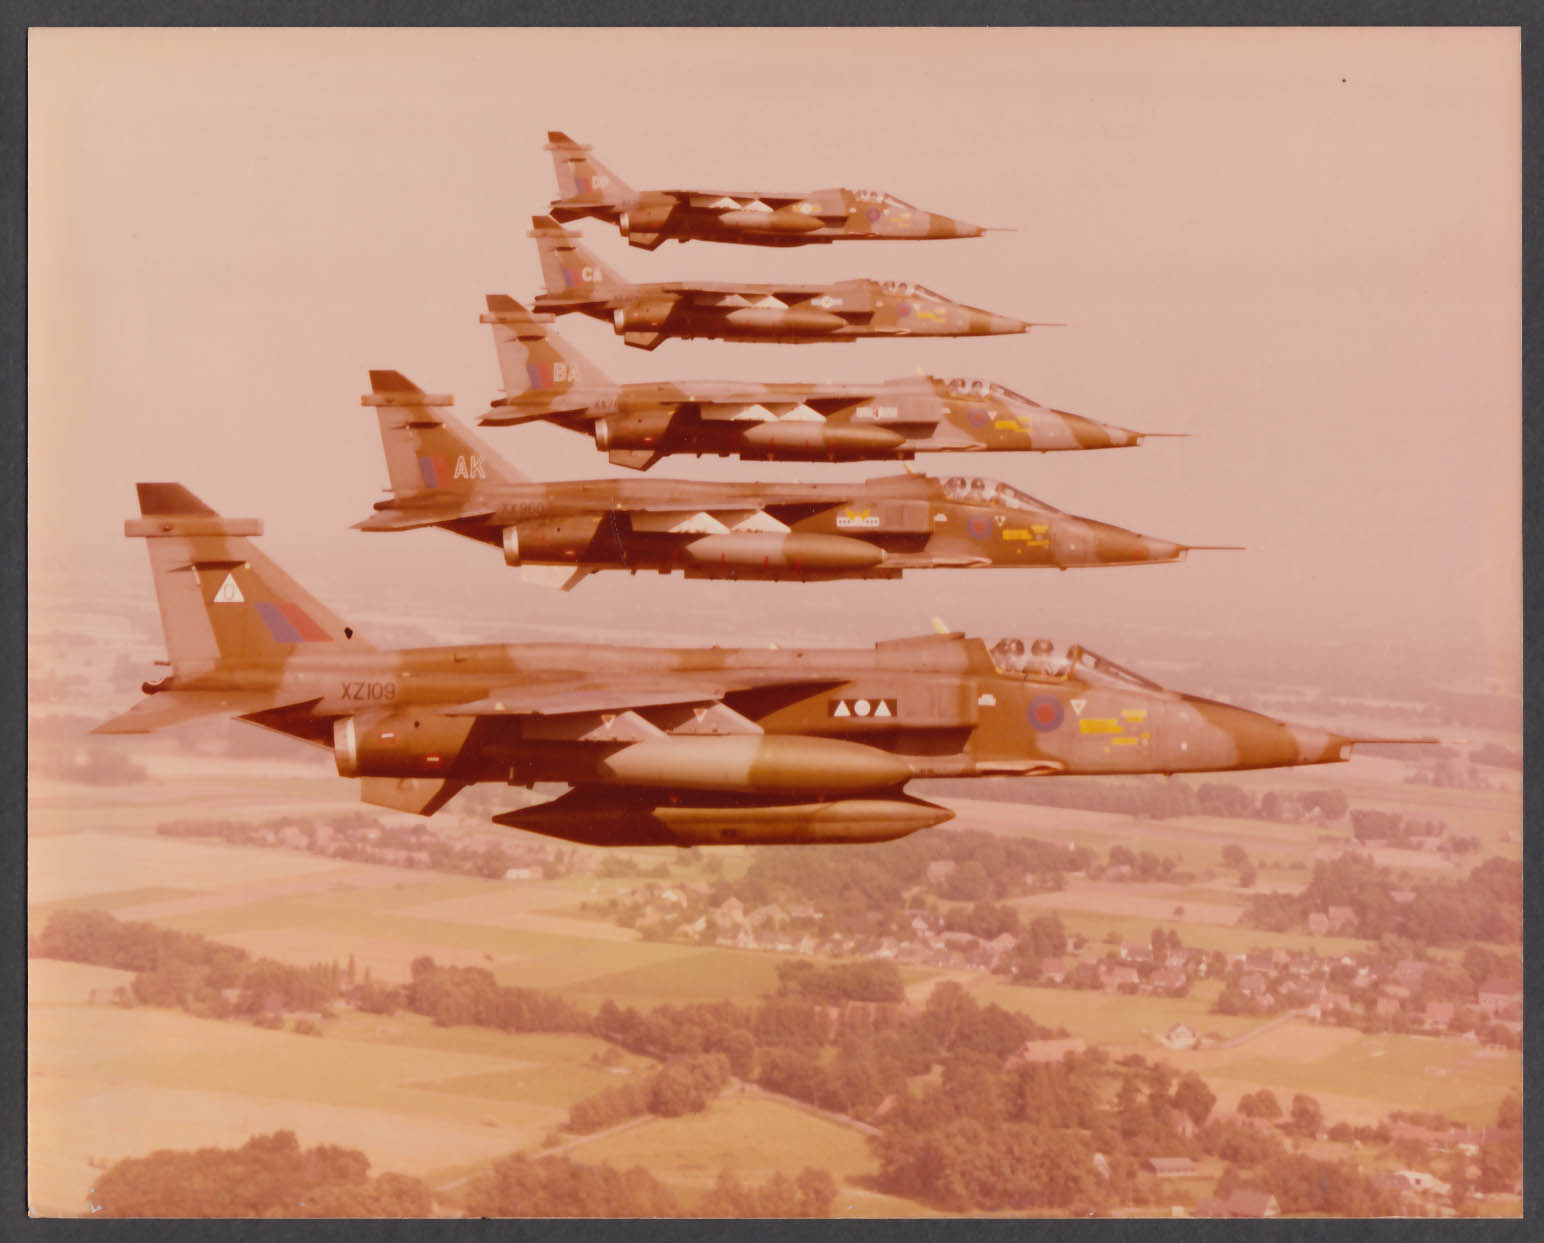 Image for RAF Squadron Leader Bill Langworthy in Jaguar 8x10 photo